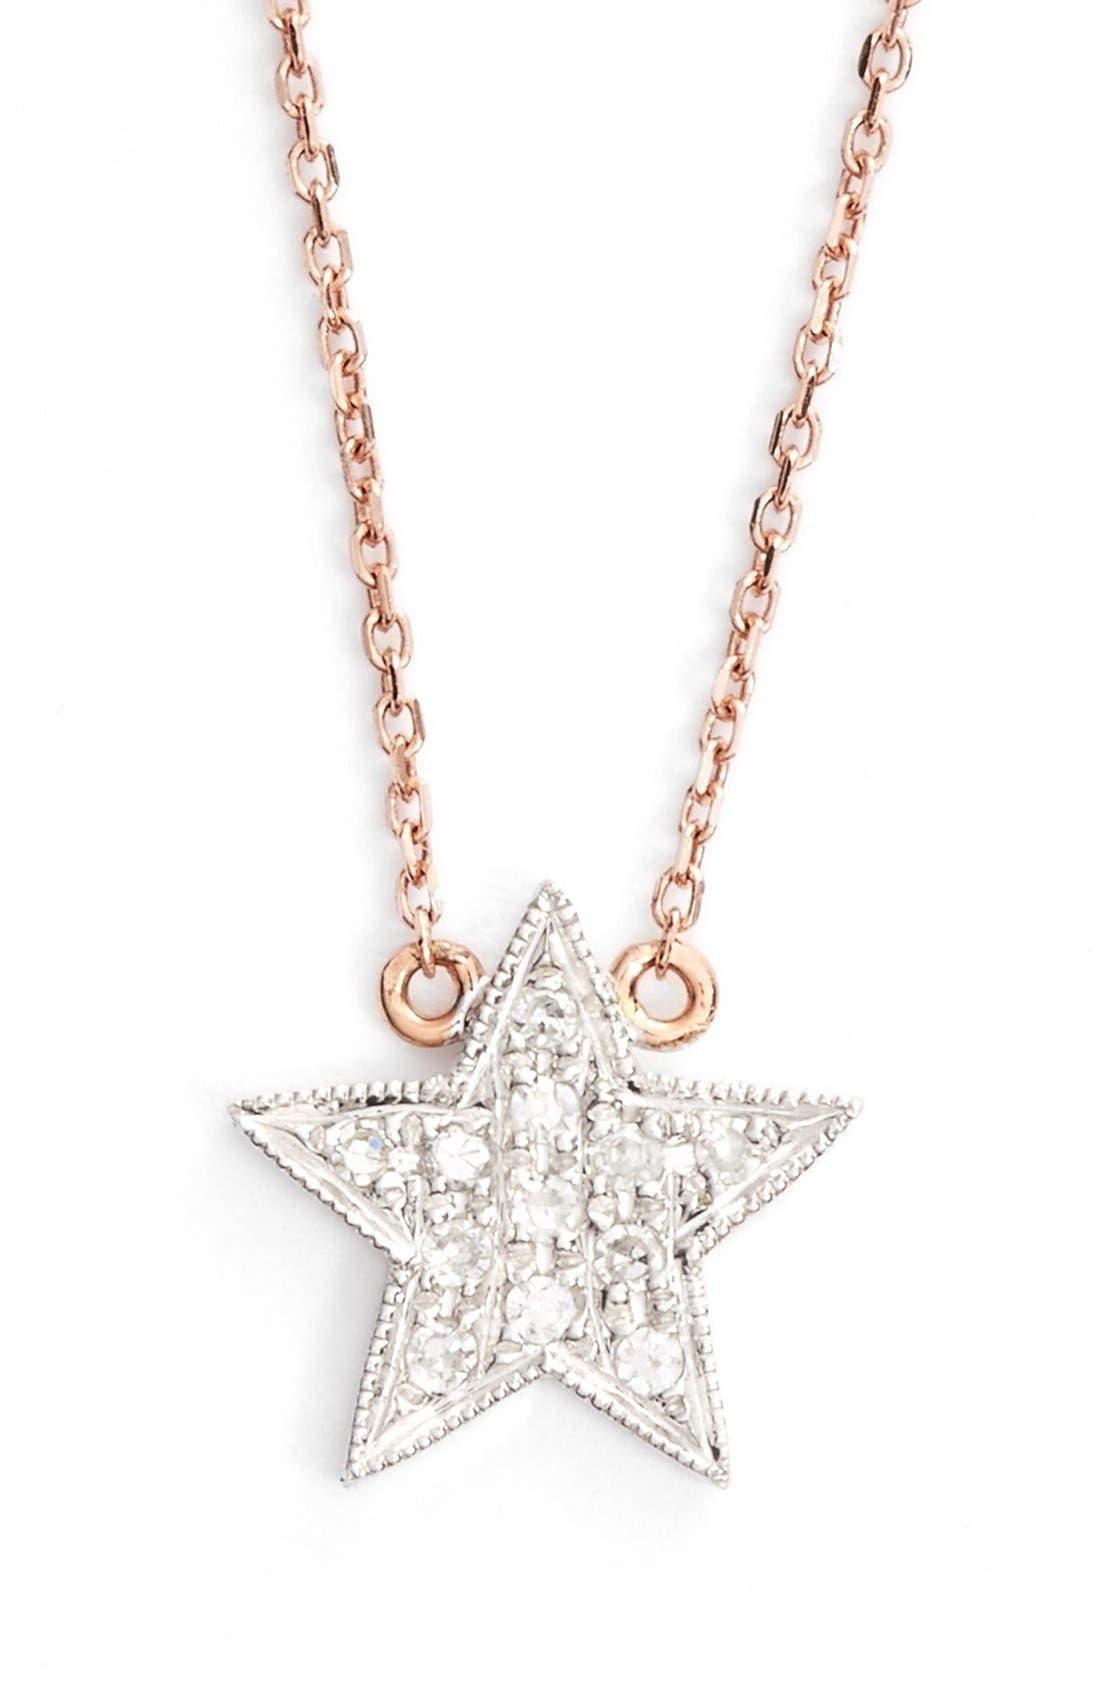 DANA REBECCA DESIGNS Julianne Himiko Diamond Star Pendant Necklace